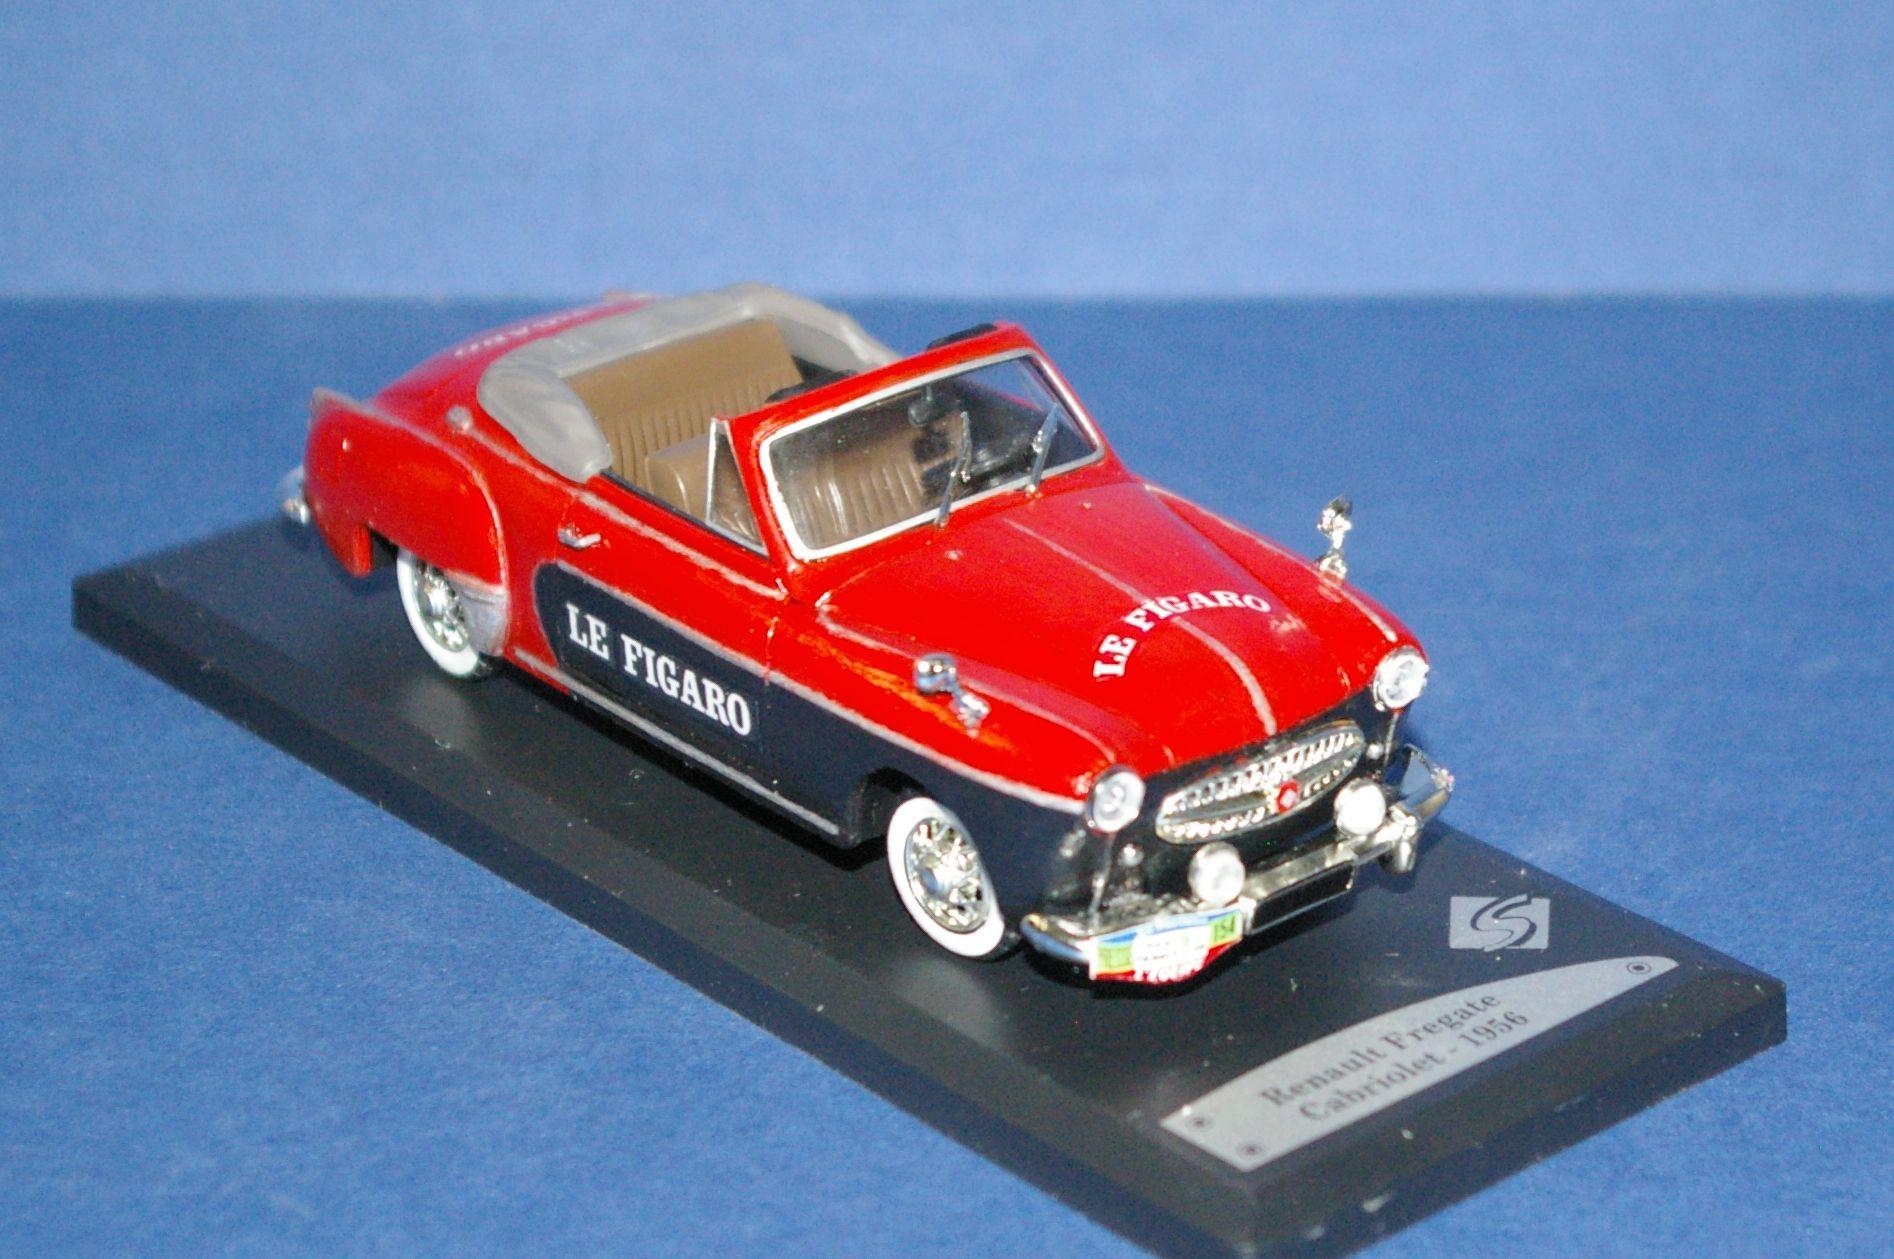 renault fr gate le figaro tour de france 1956 die cast cycling cars pinterest cars. Black Bedroom Furniture Sets. Home Design Ideas